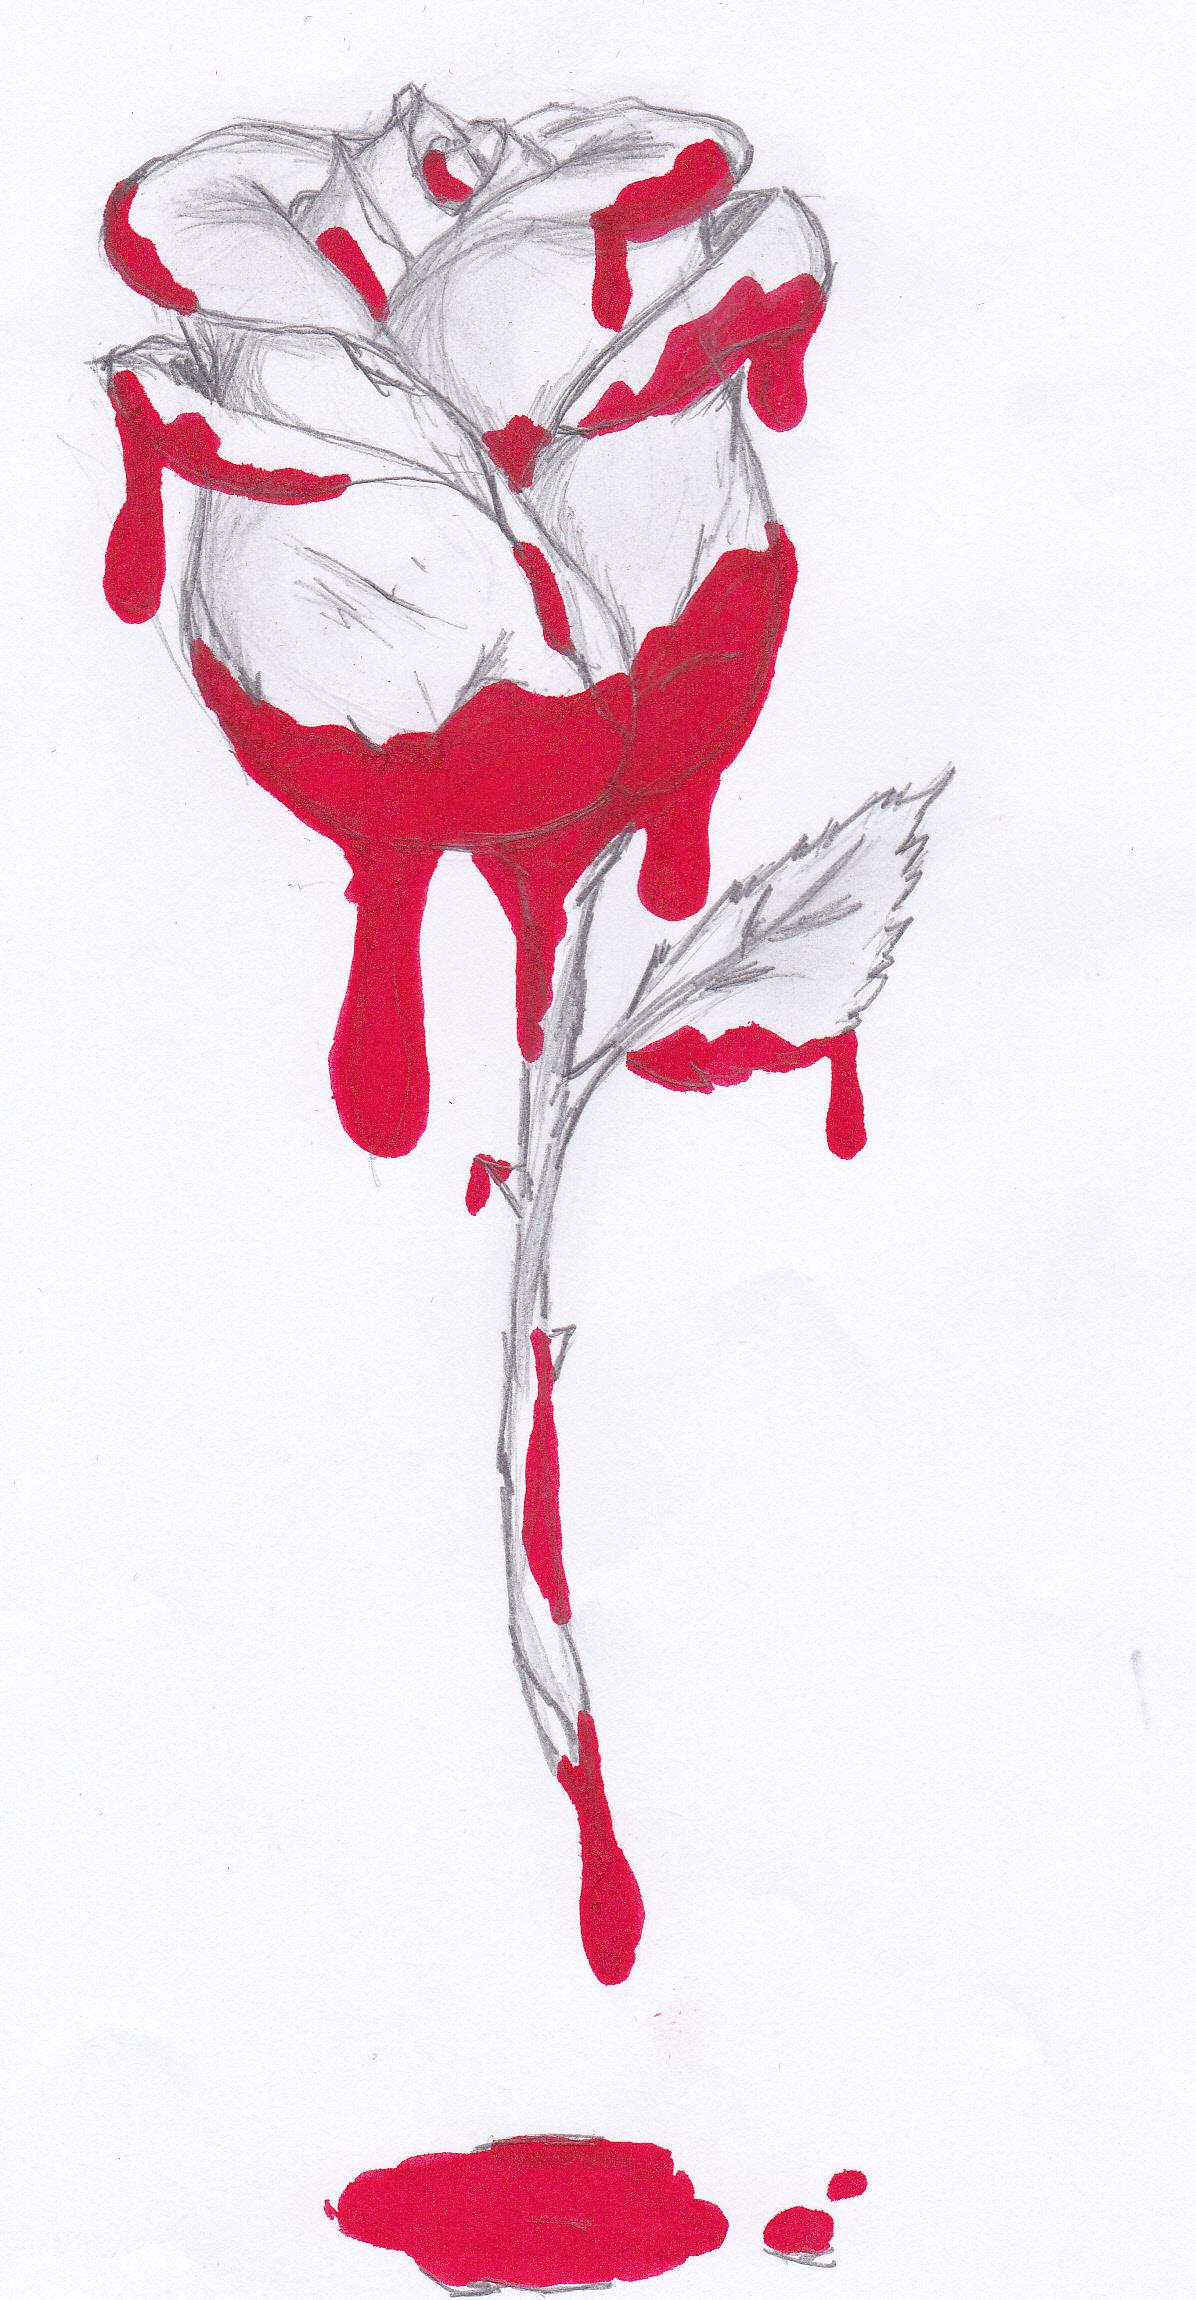 Drawn rose bleeding rose A Bleeding person A rose